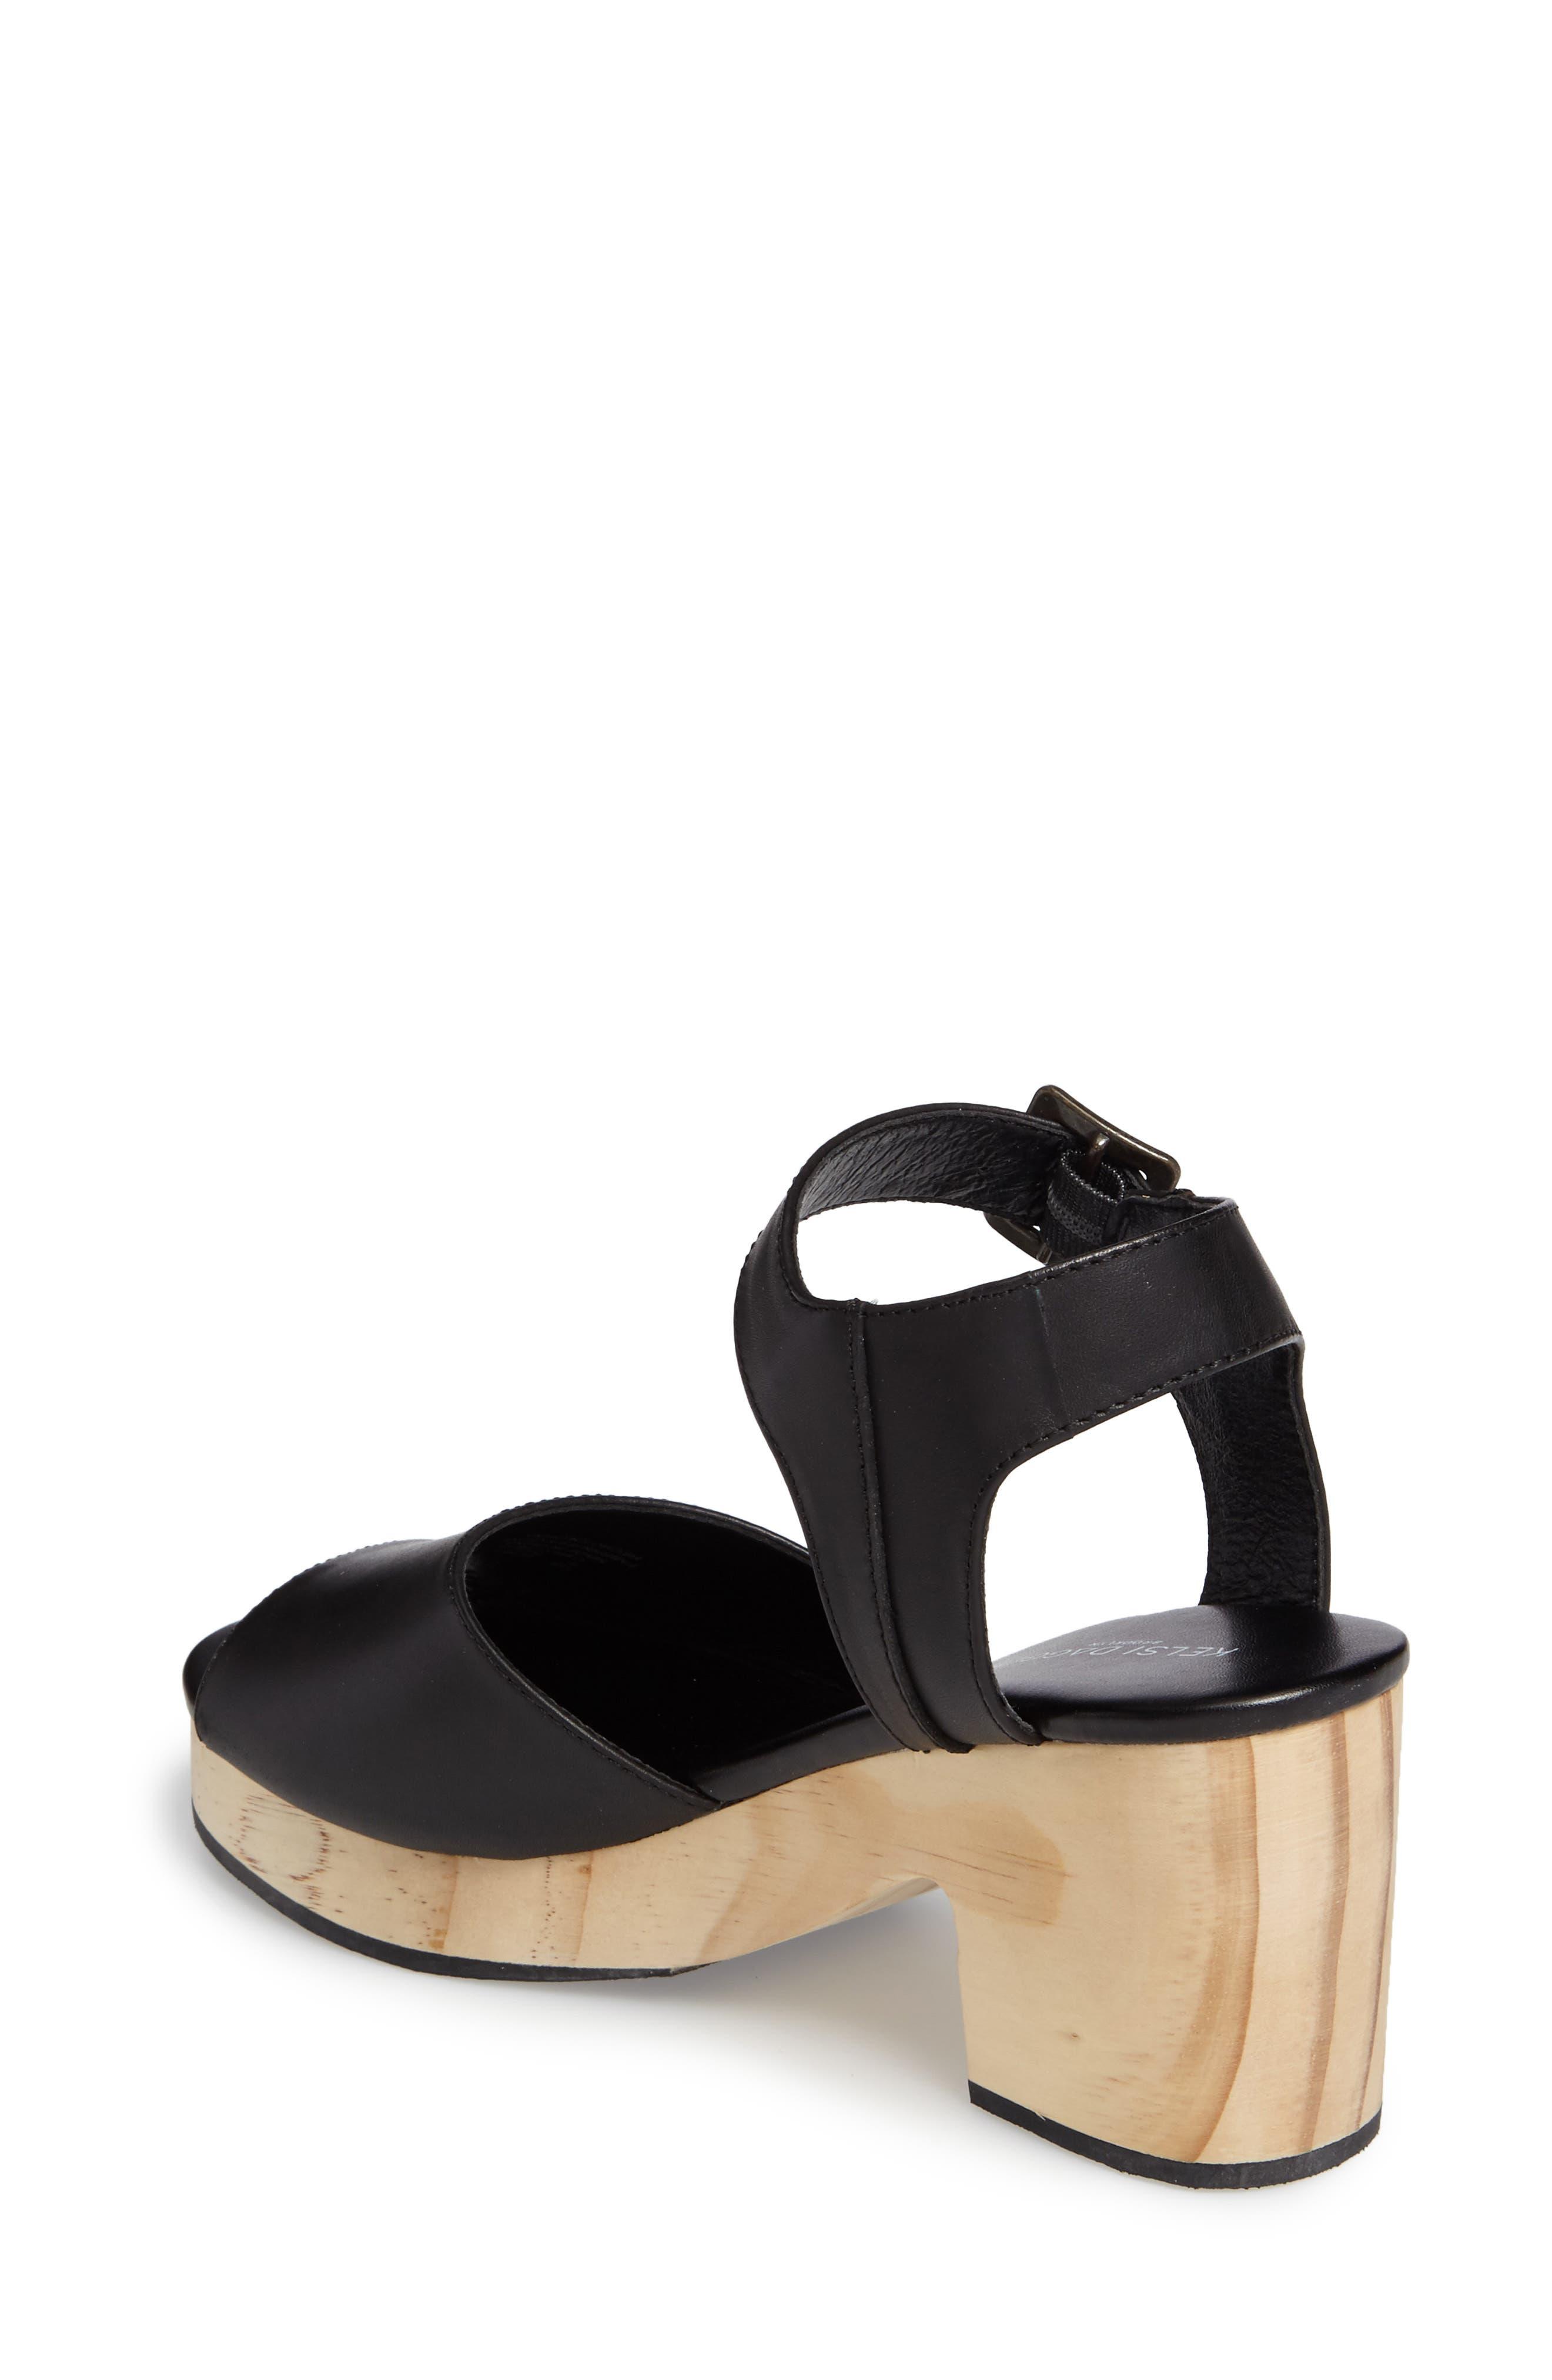 Montgomery Platform Sandal,                             Alternate thumbnail 2, color,                             Black Leather